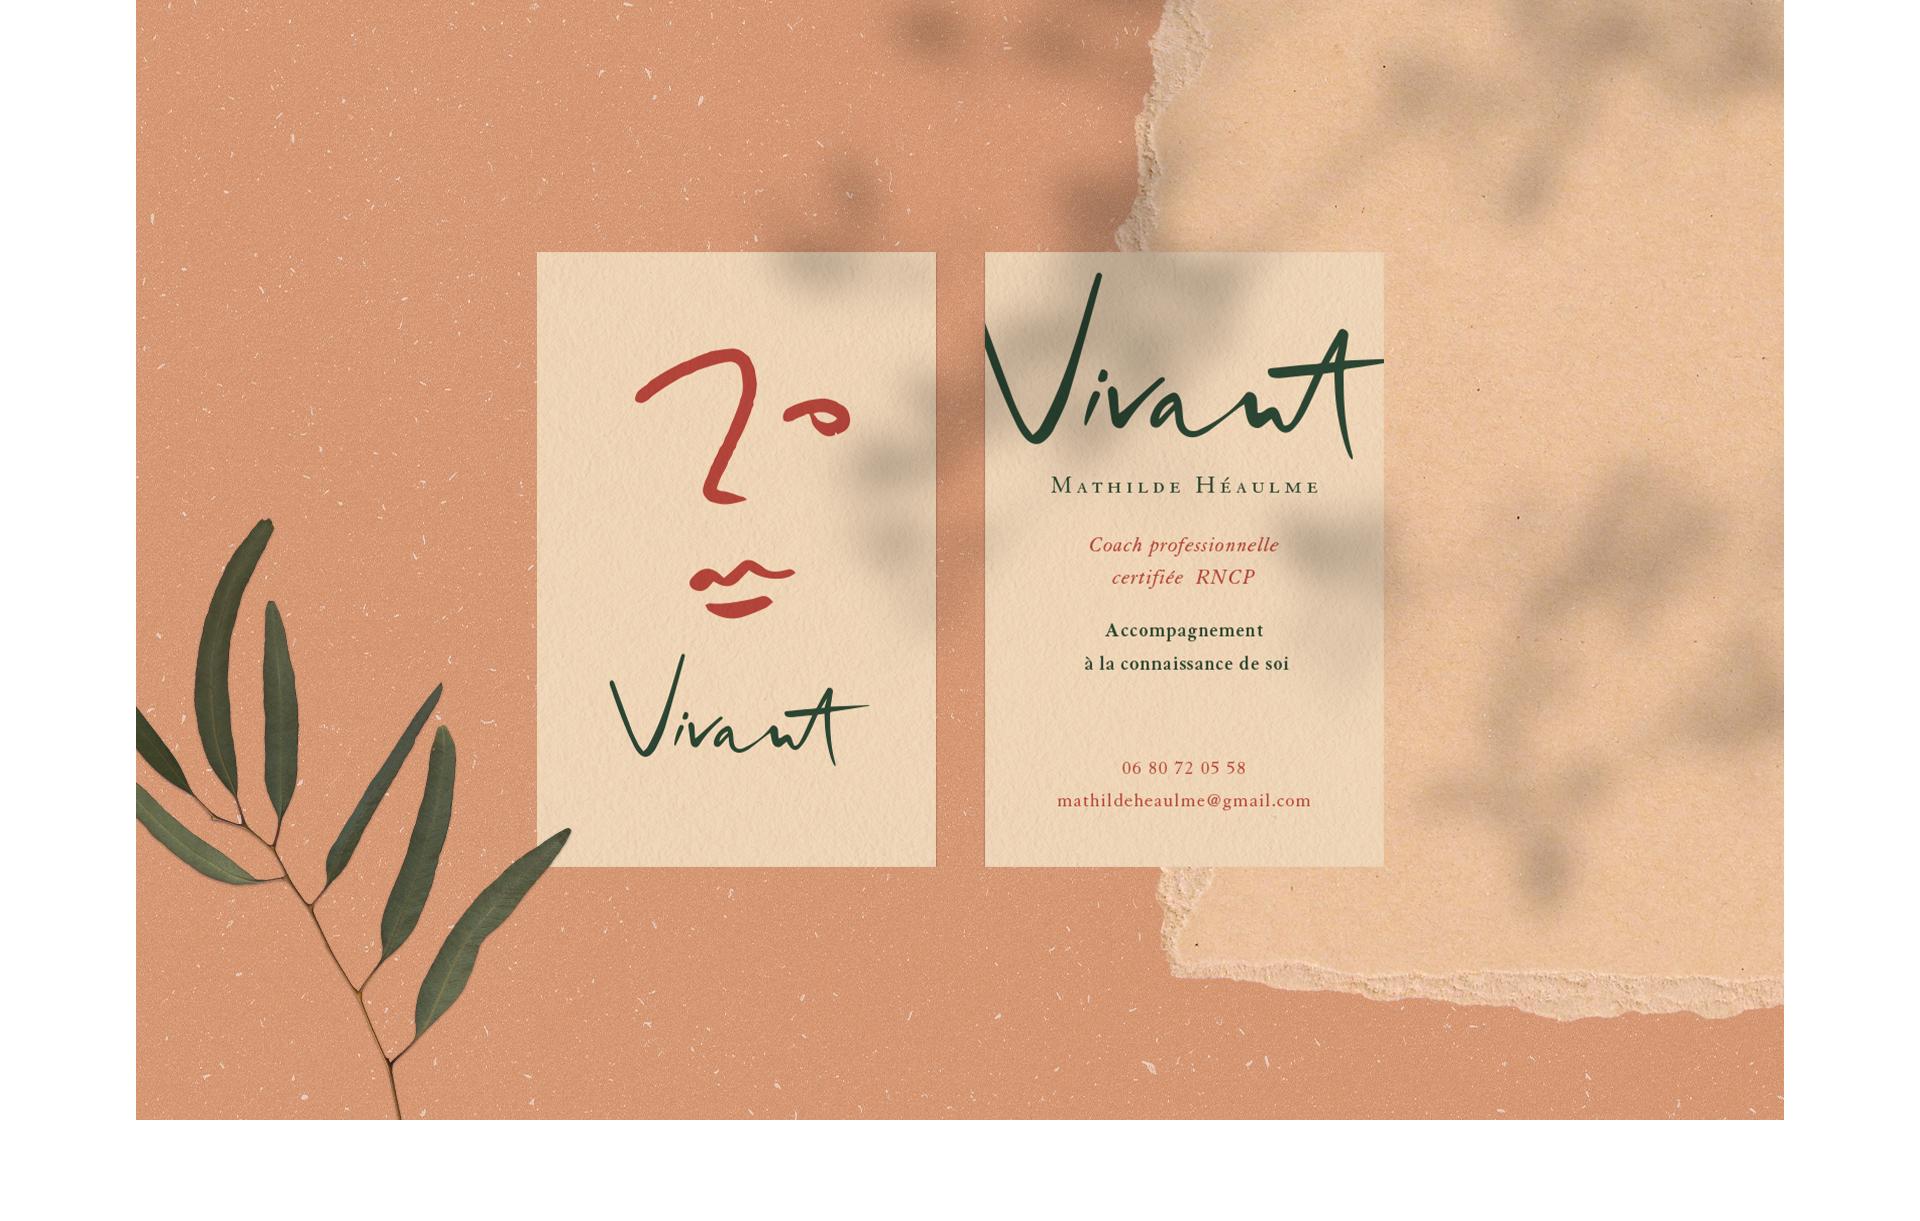 _Vivant-copie-5